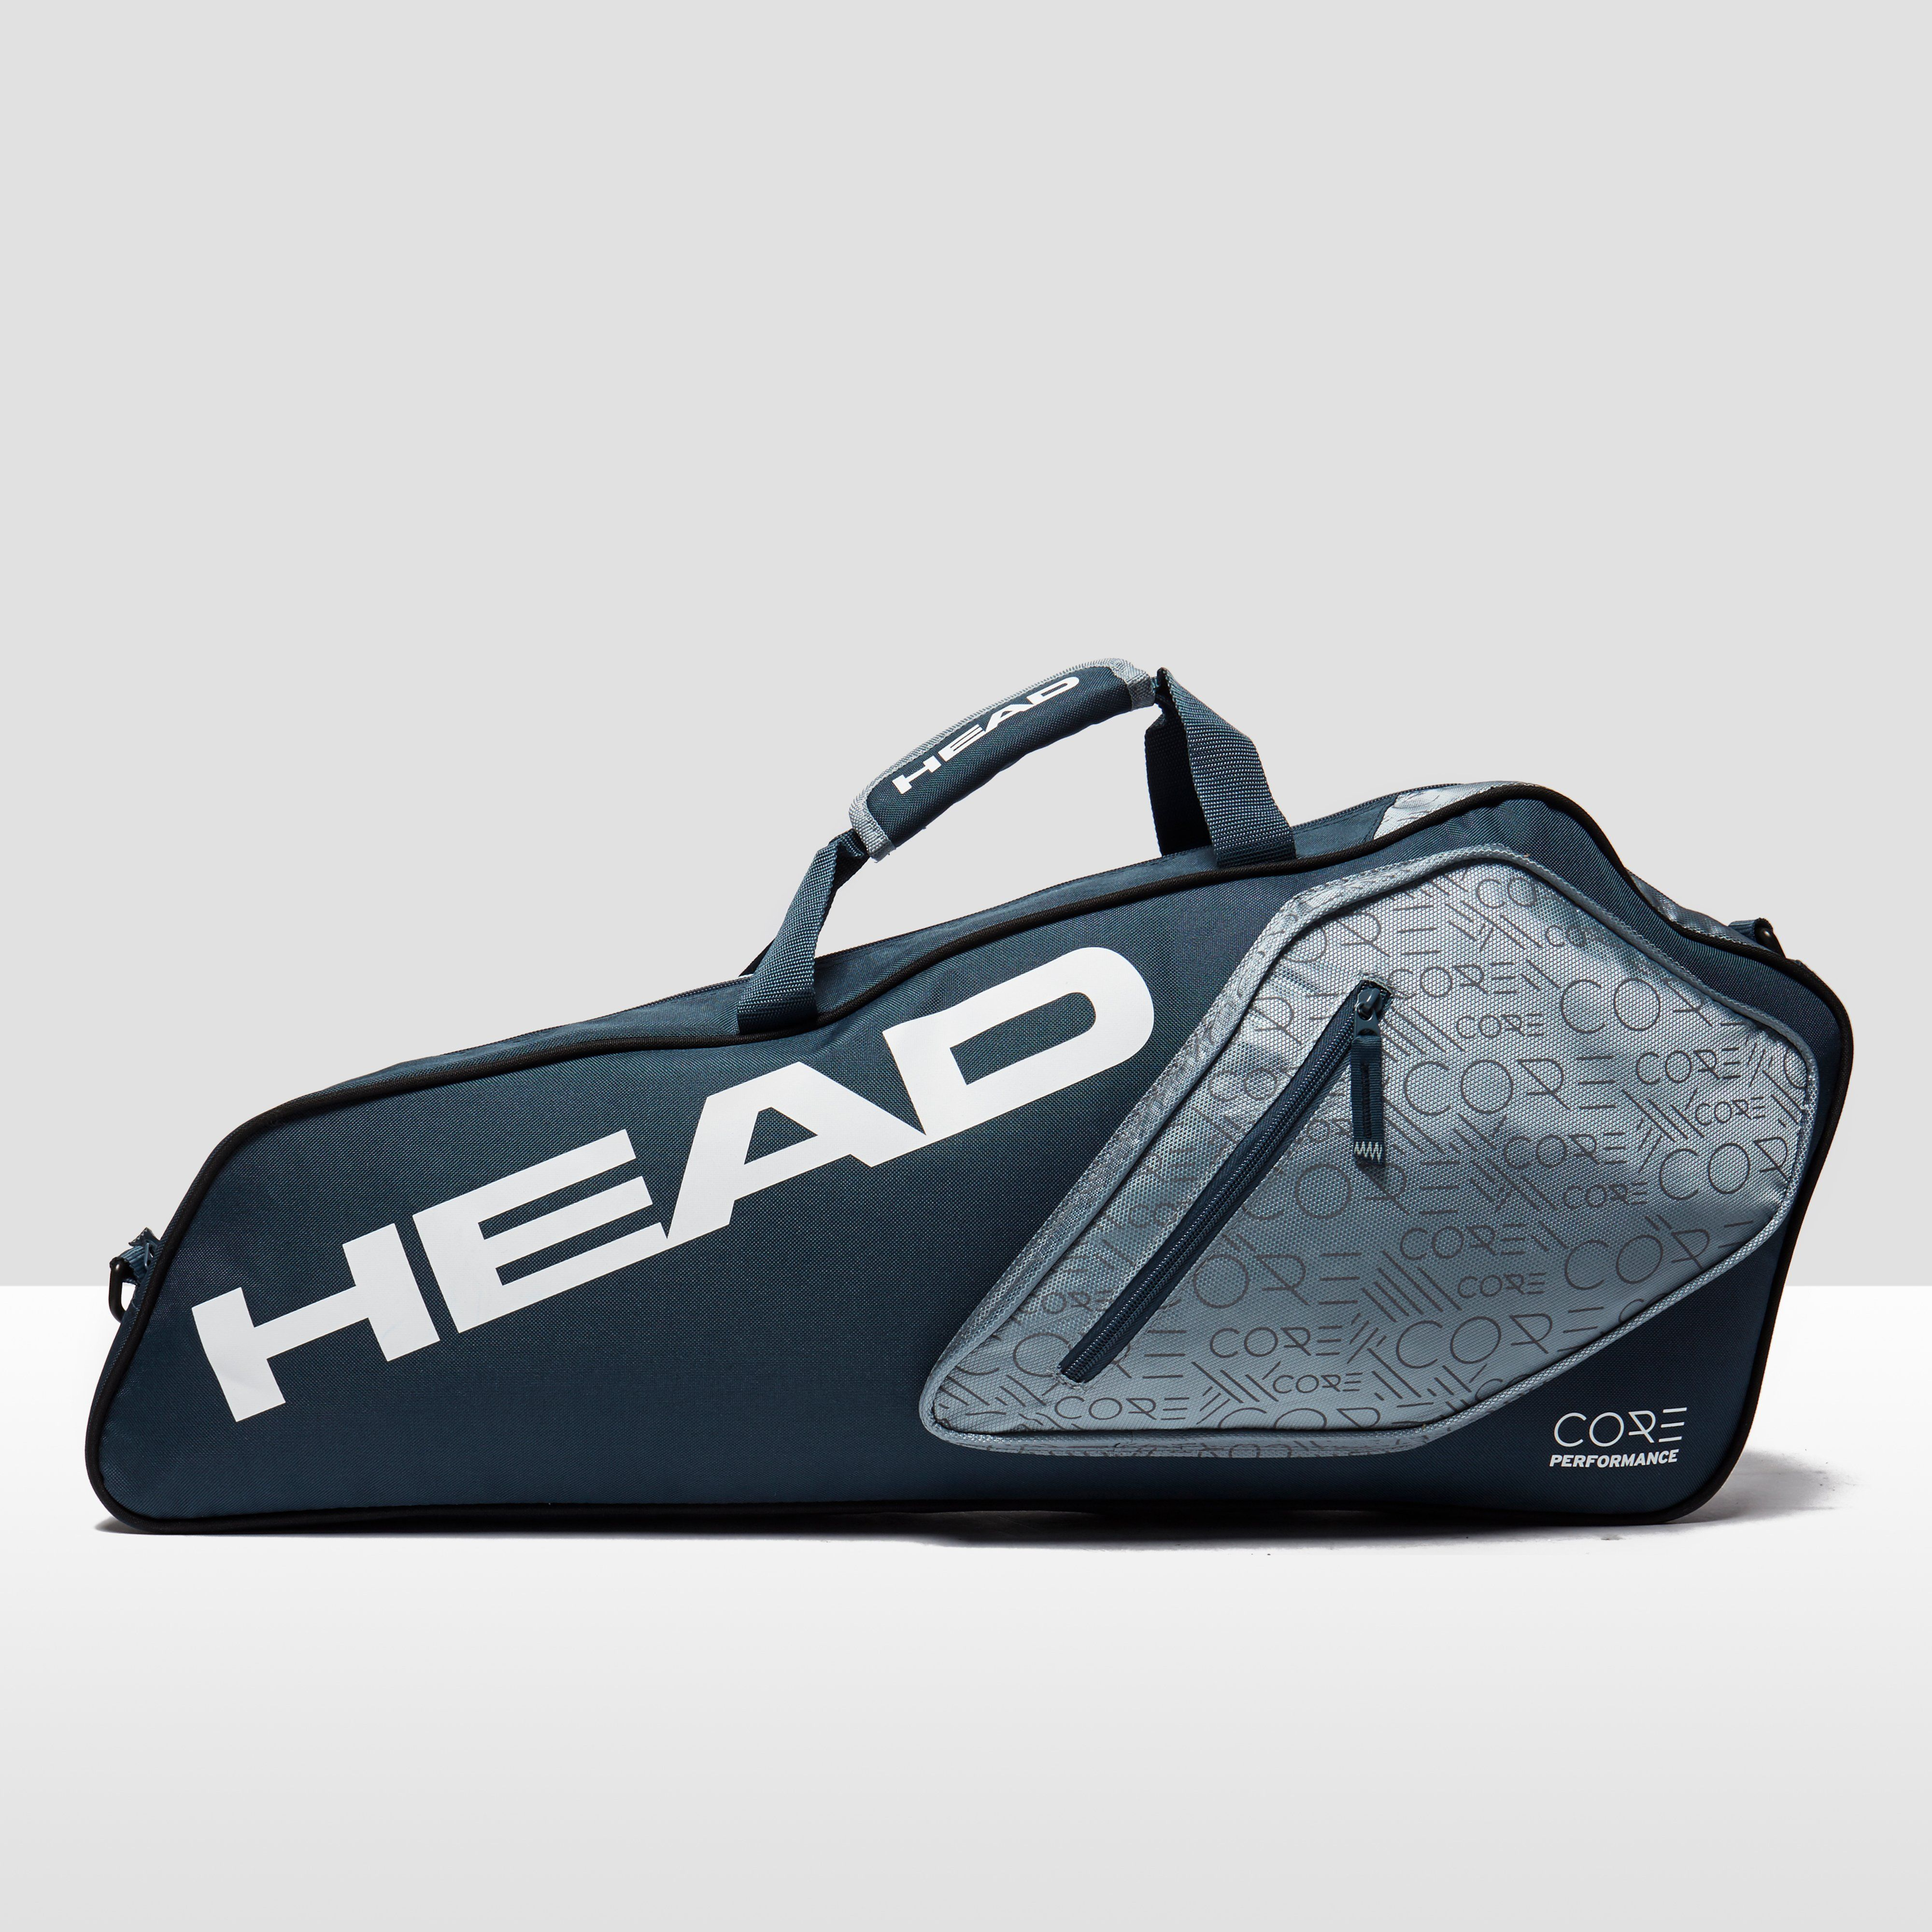 Head Core 3R Pro Racketbag